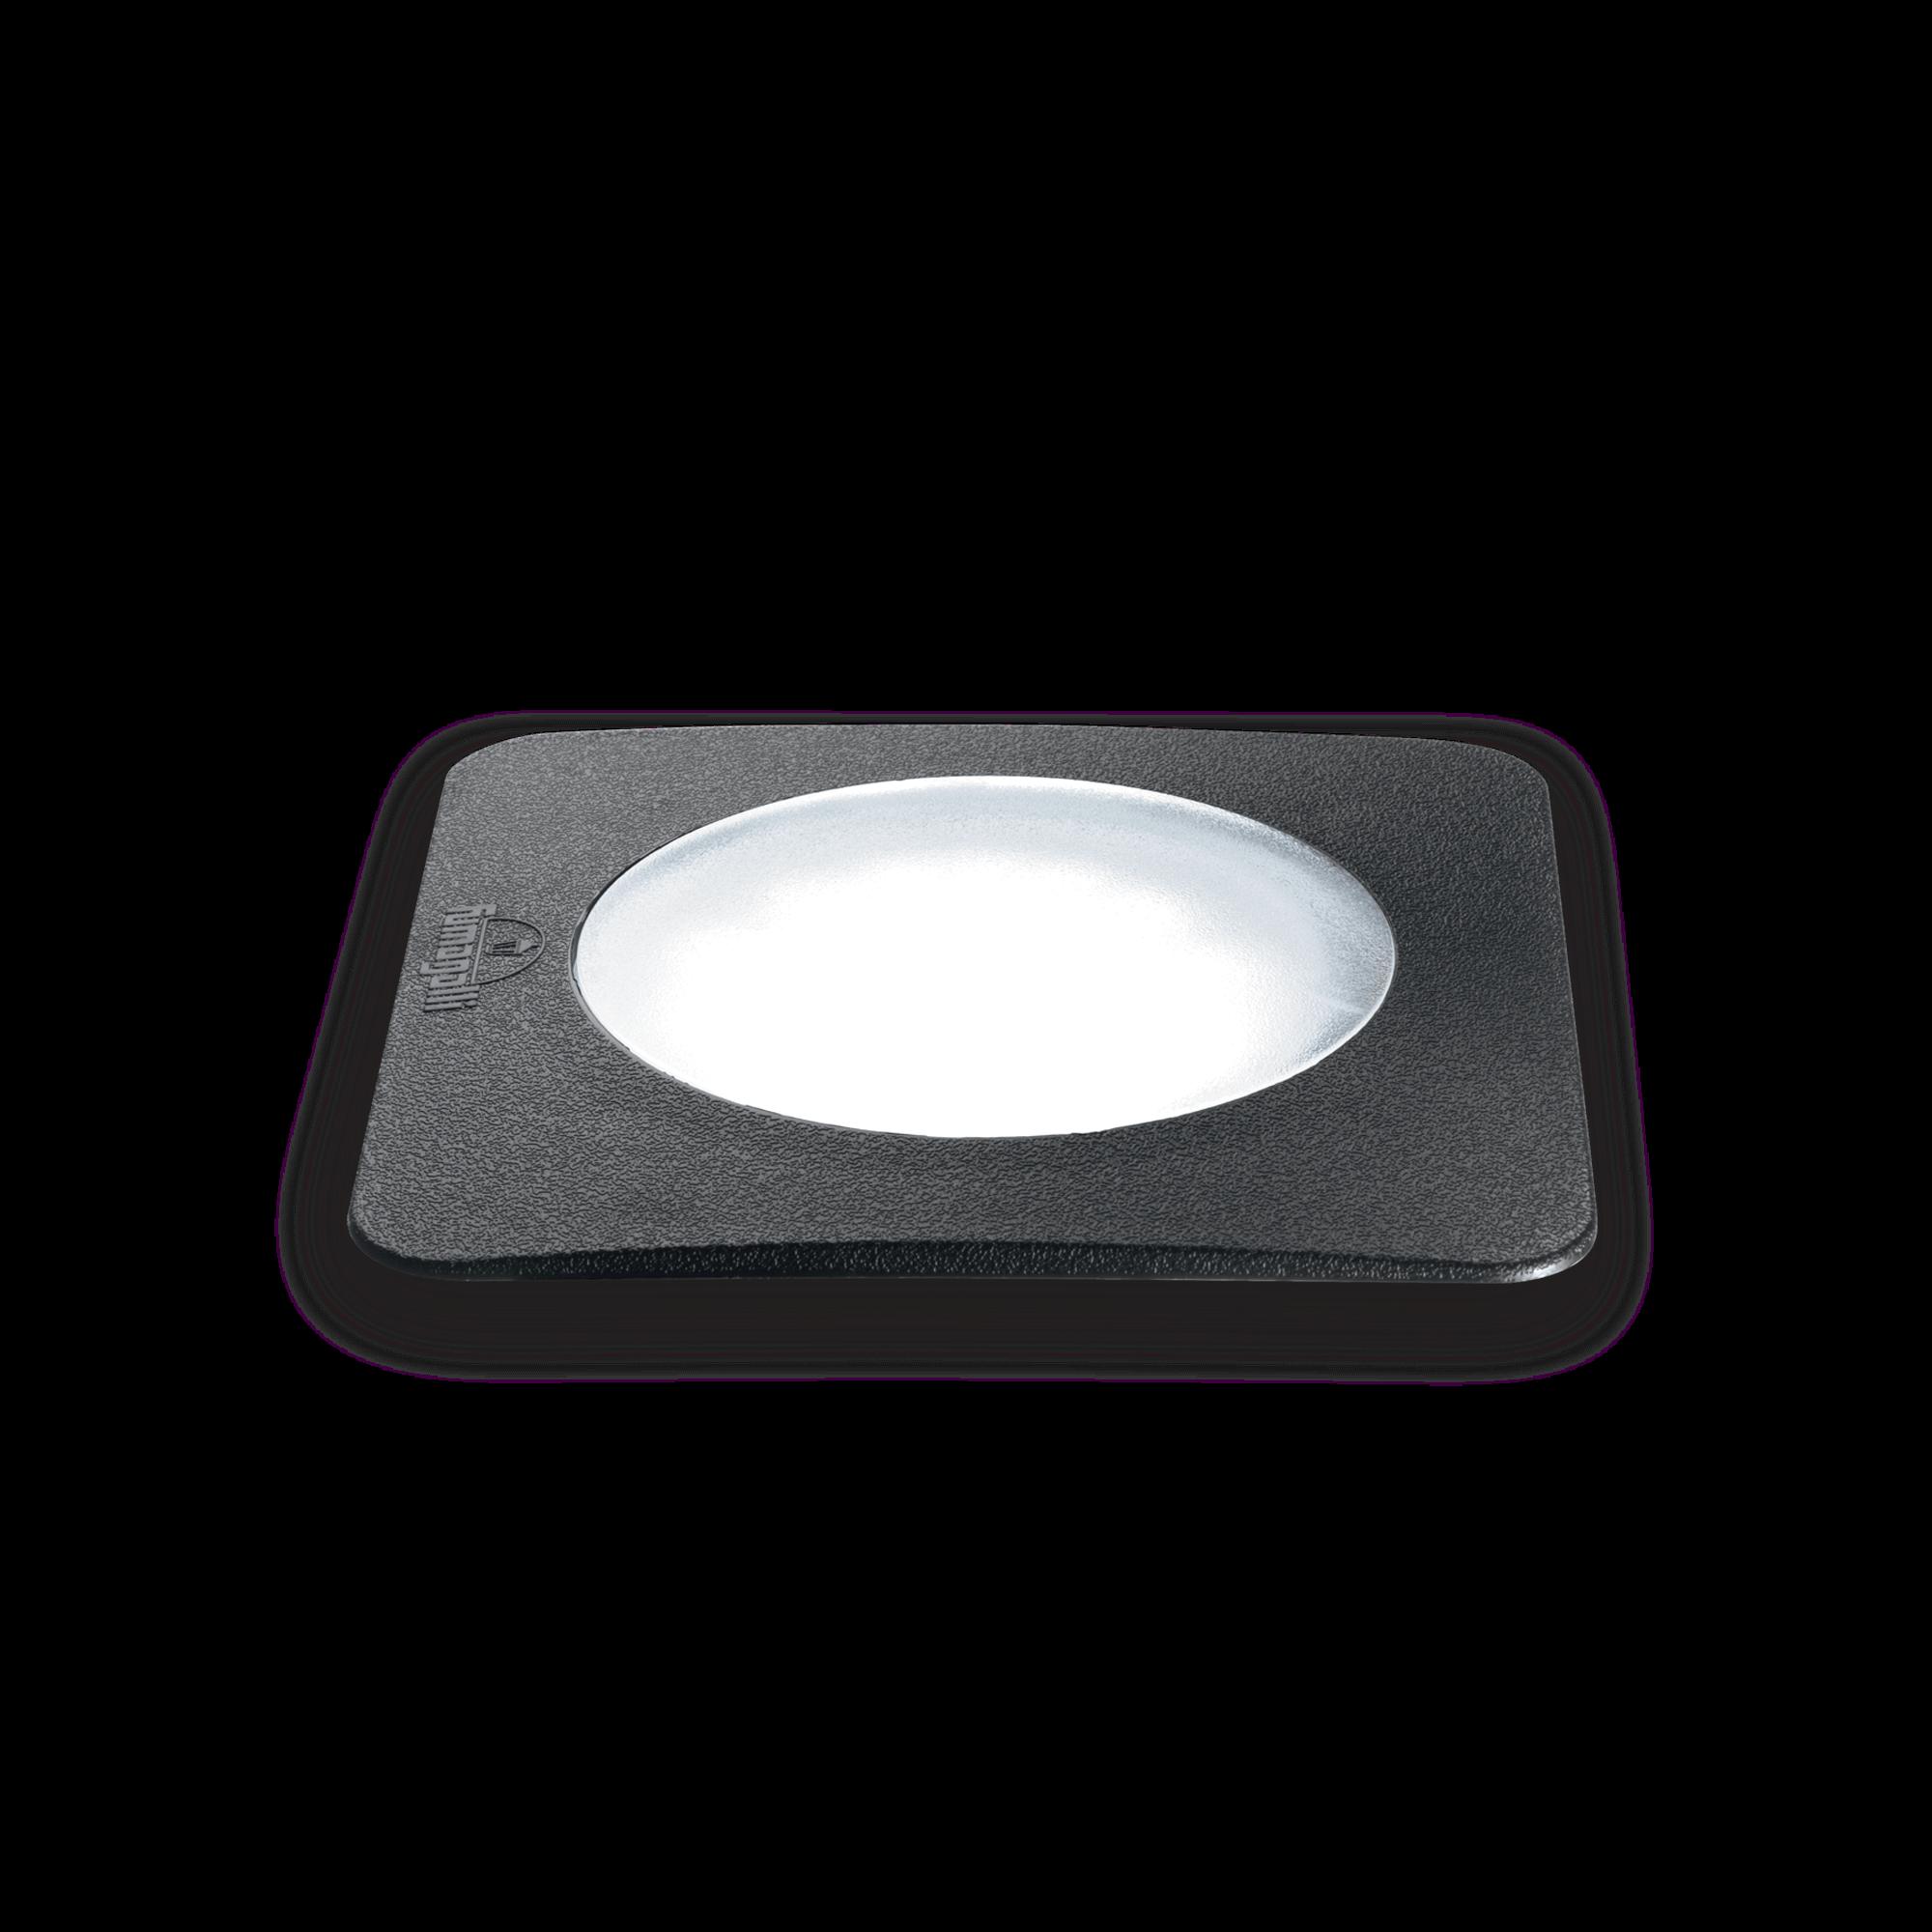 Exteriérové zápustné svítidlo Ideal lux 120386 CECI PT1 SQUARE BIG 1xGX53 23W 4000K IP67